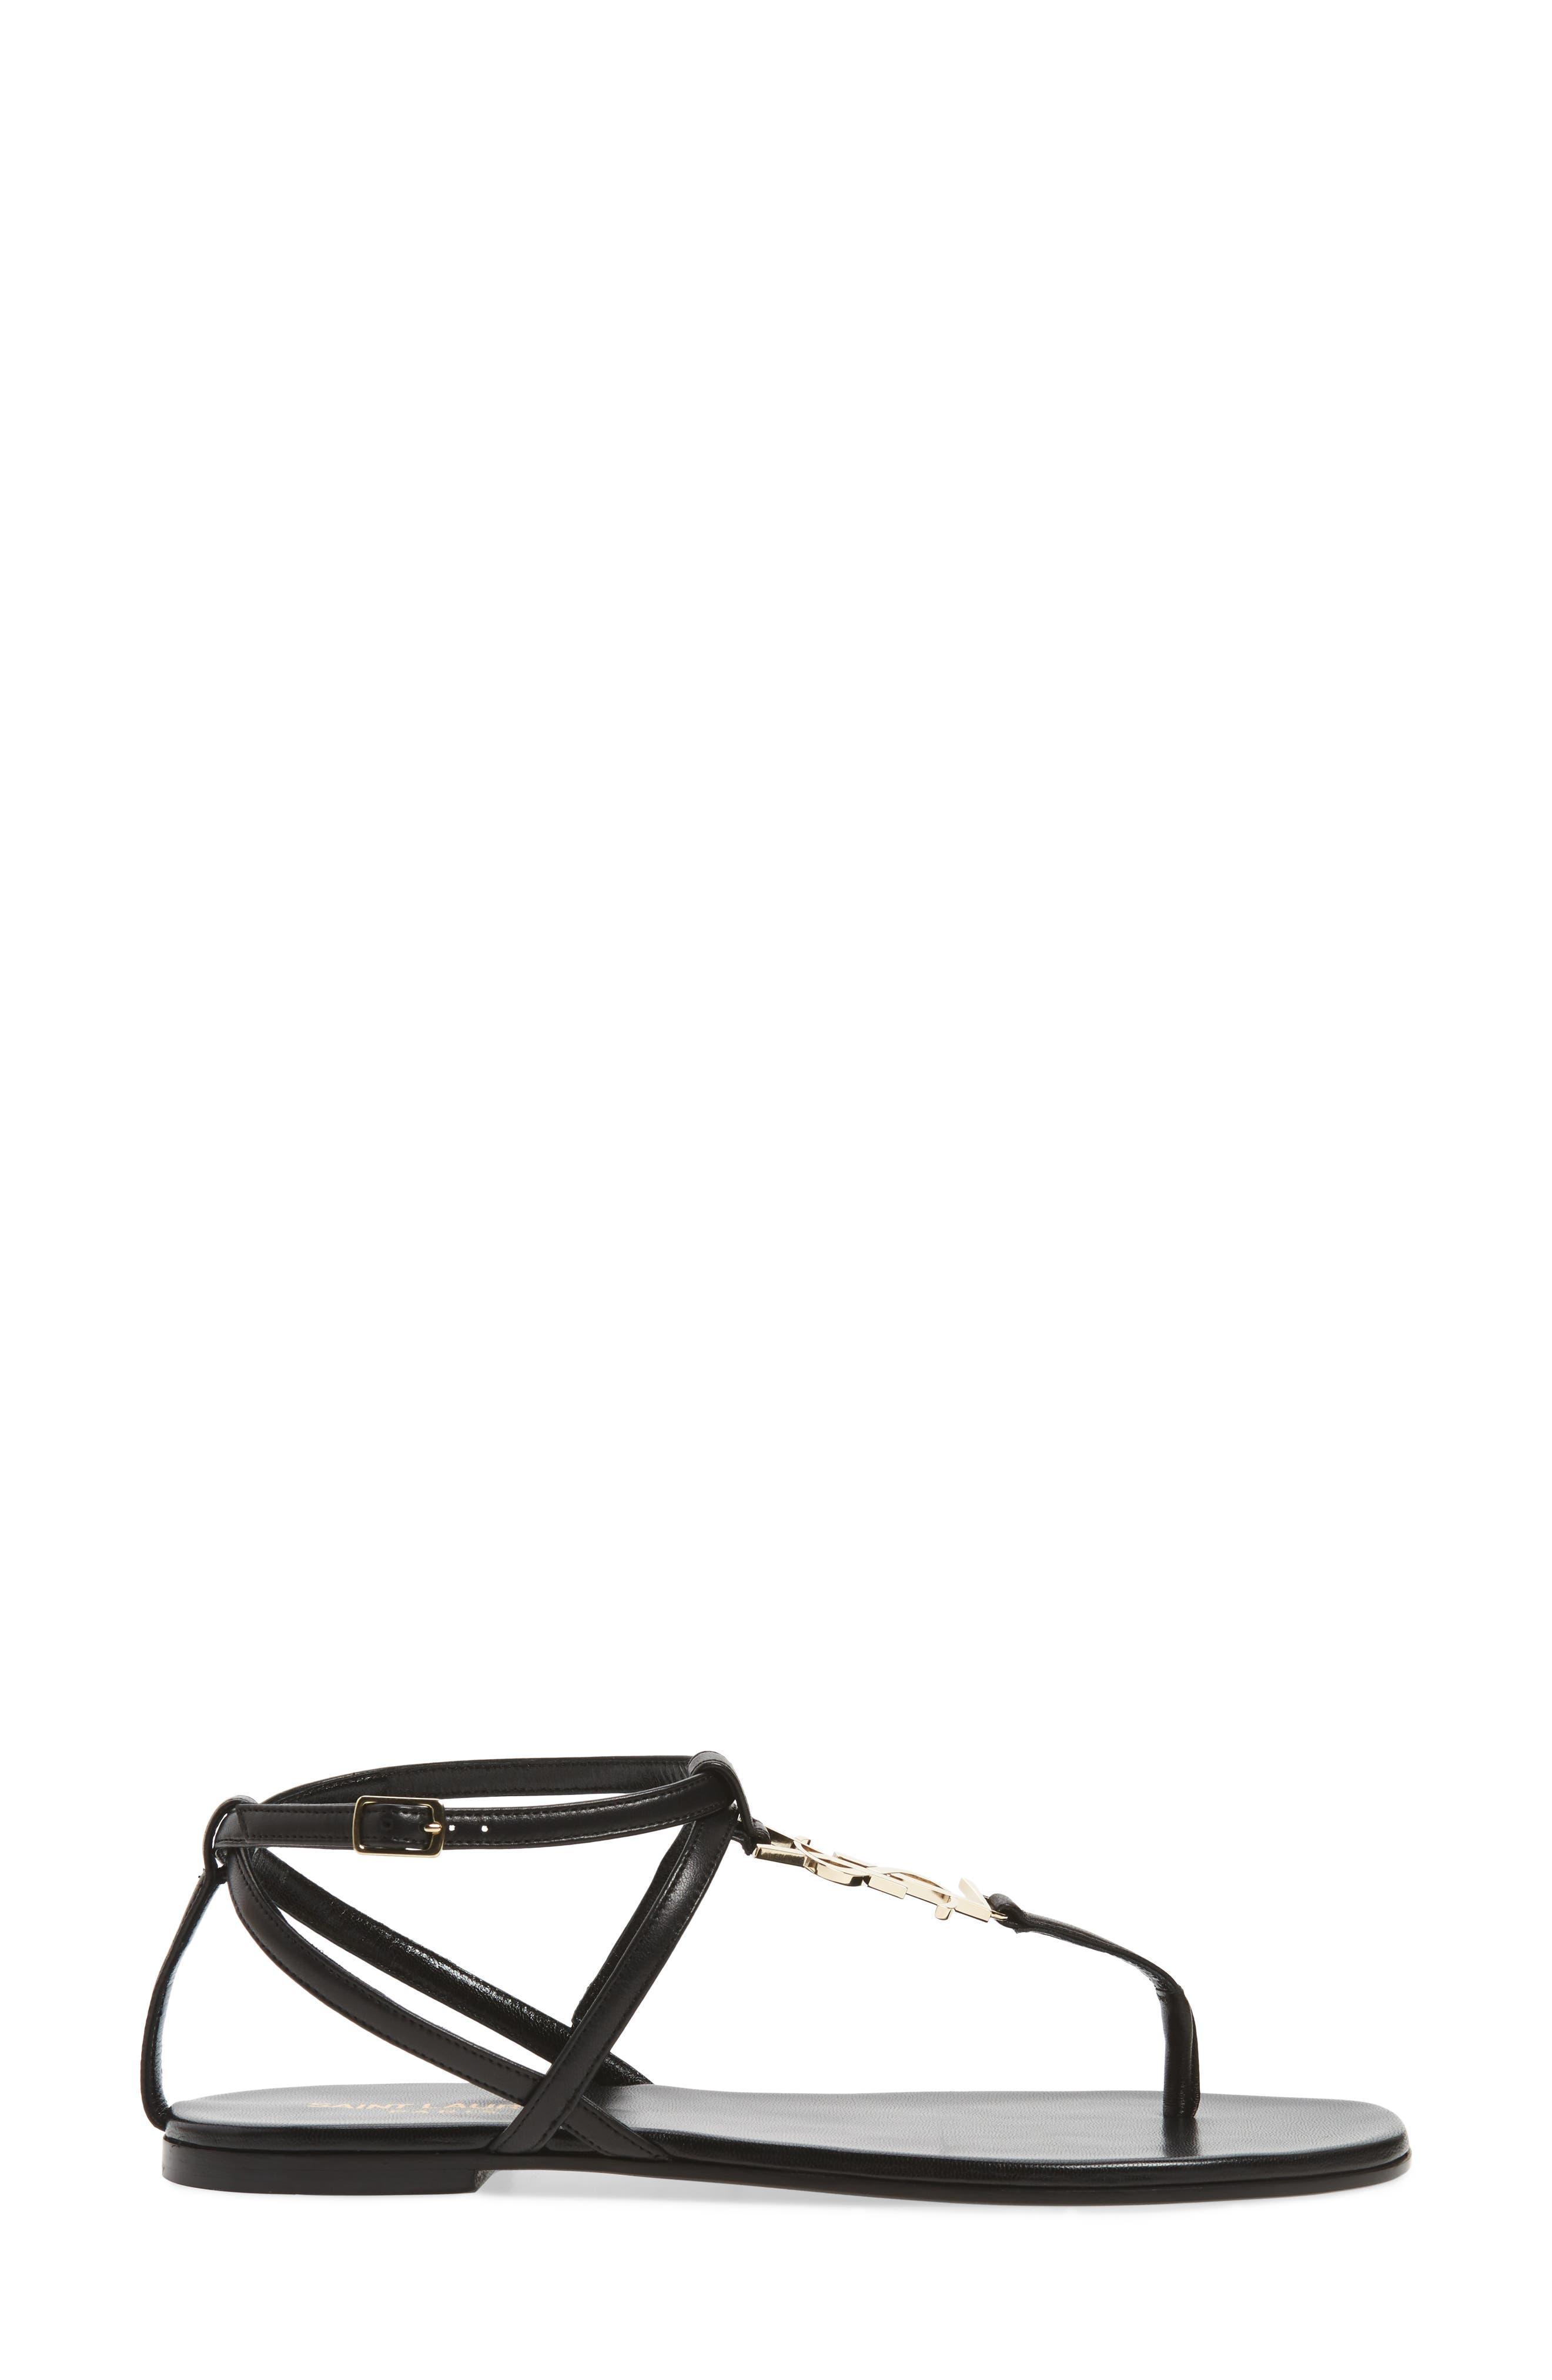 Nu Pied T-Strap Sandal,                             Alternate thumbnail 3, color,                             BLACK/ GOLD